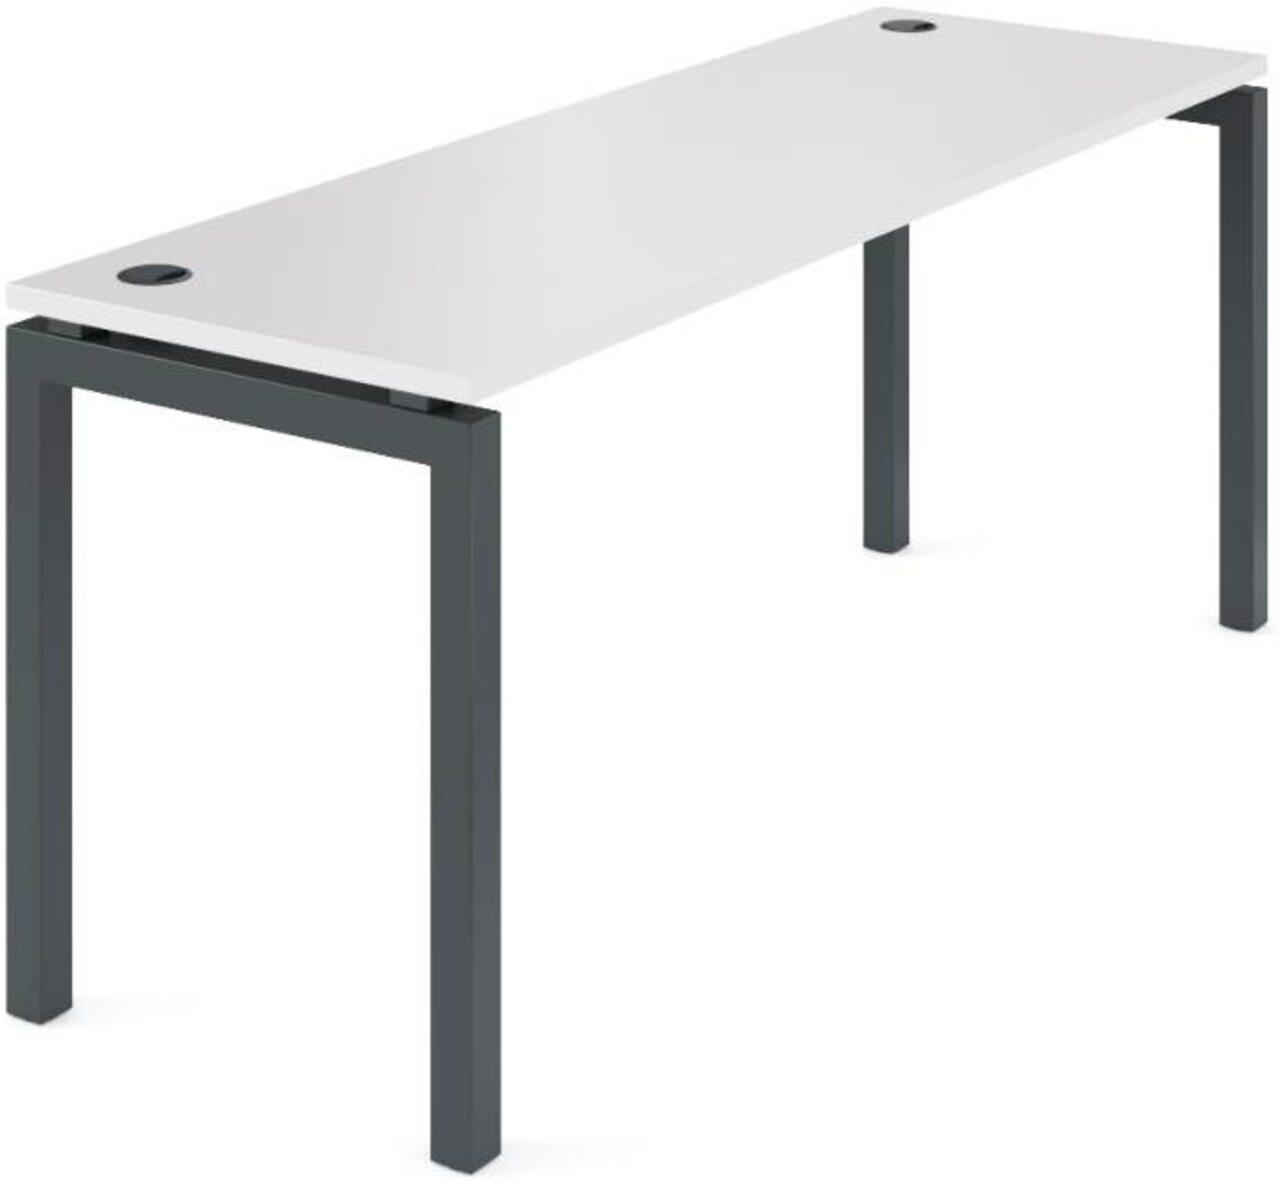 Стол на металлокаркасе  Арго 180x60x76 - фото 4